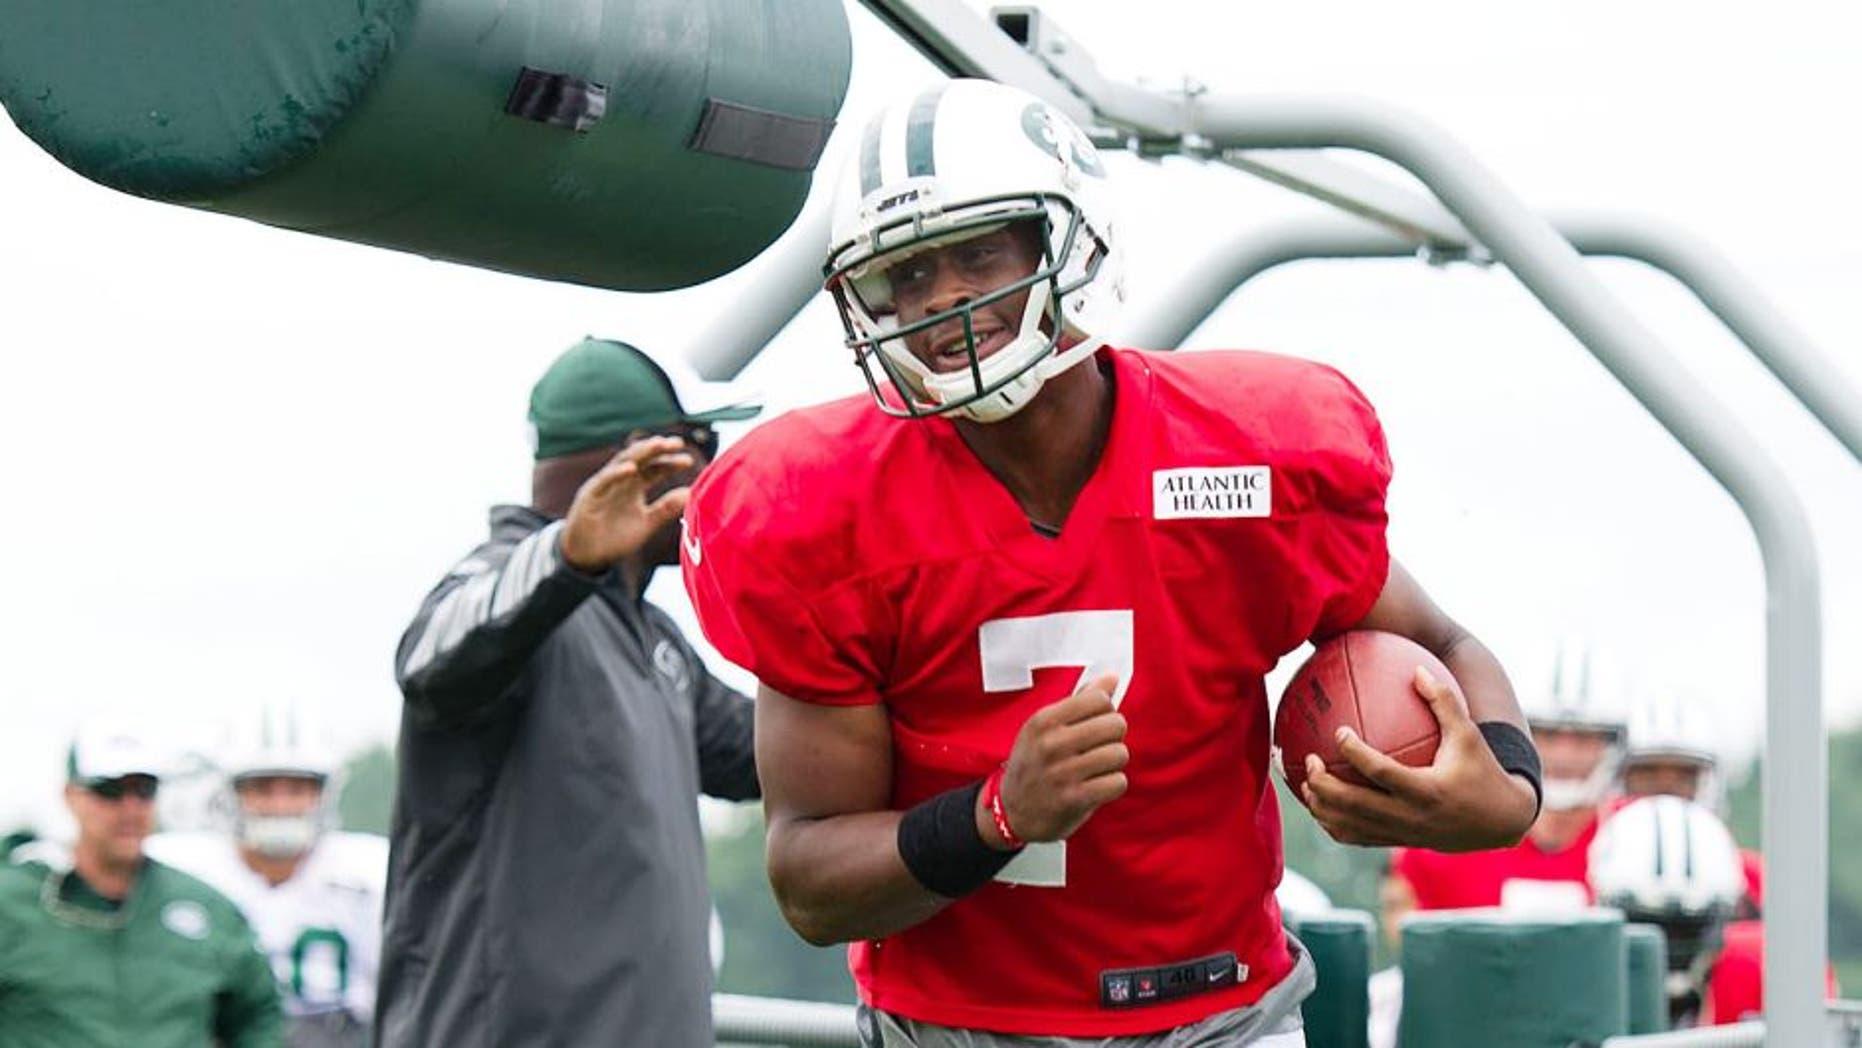 Aug 4, 2014; Cortland, NY, USA; New York Jets quarterback Geno Smith (7) runs with the ball during drills at training camp at SUNY Cortland. Mandatory Credit: Rich Barnes-USA TODAY Sports